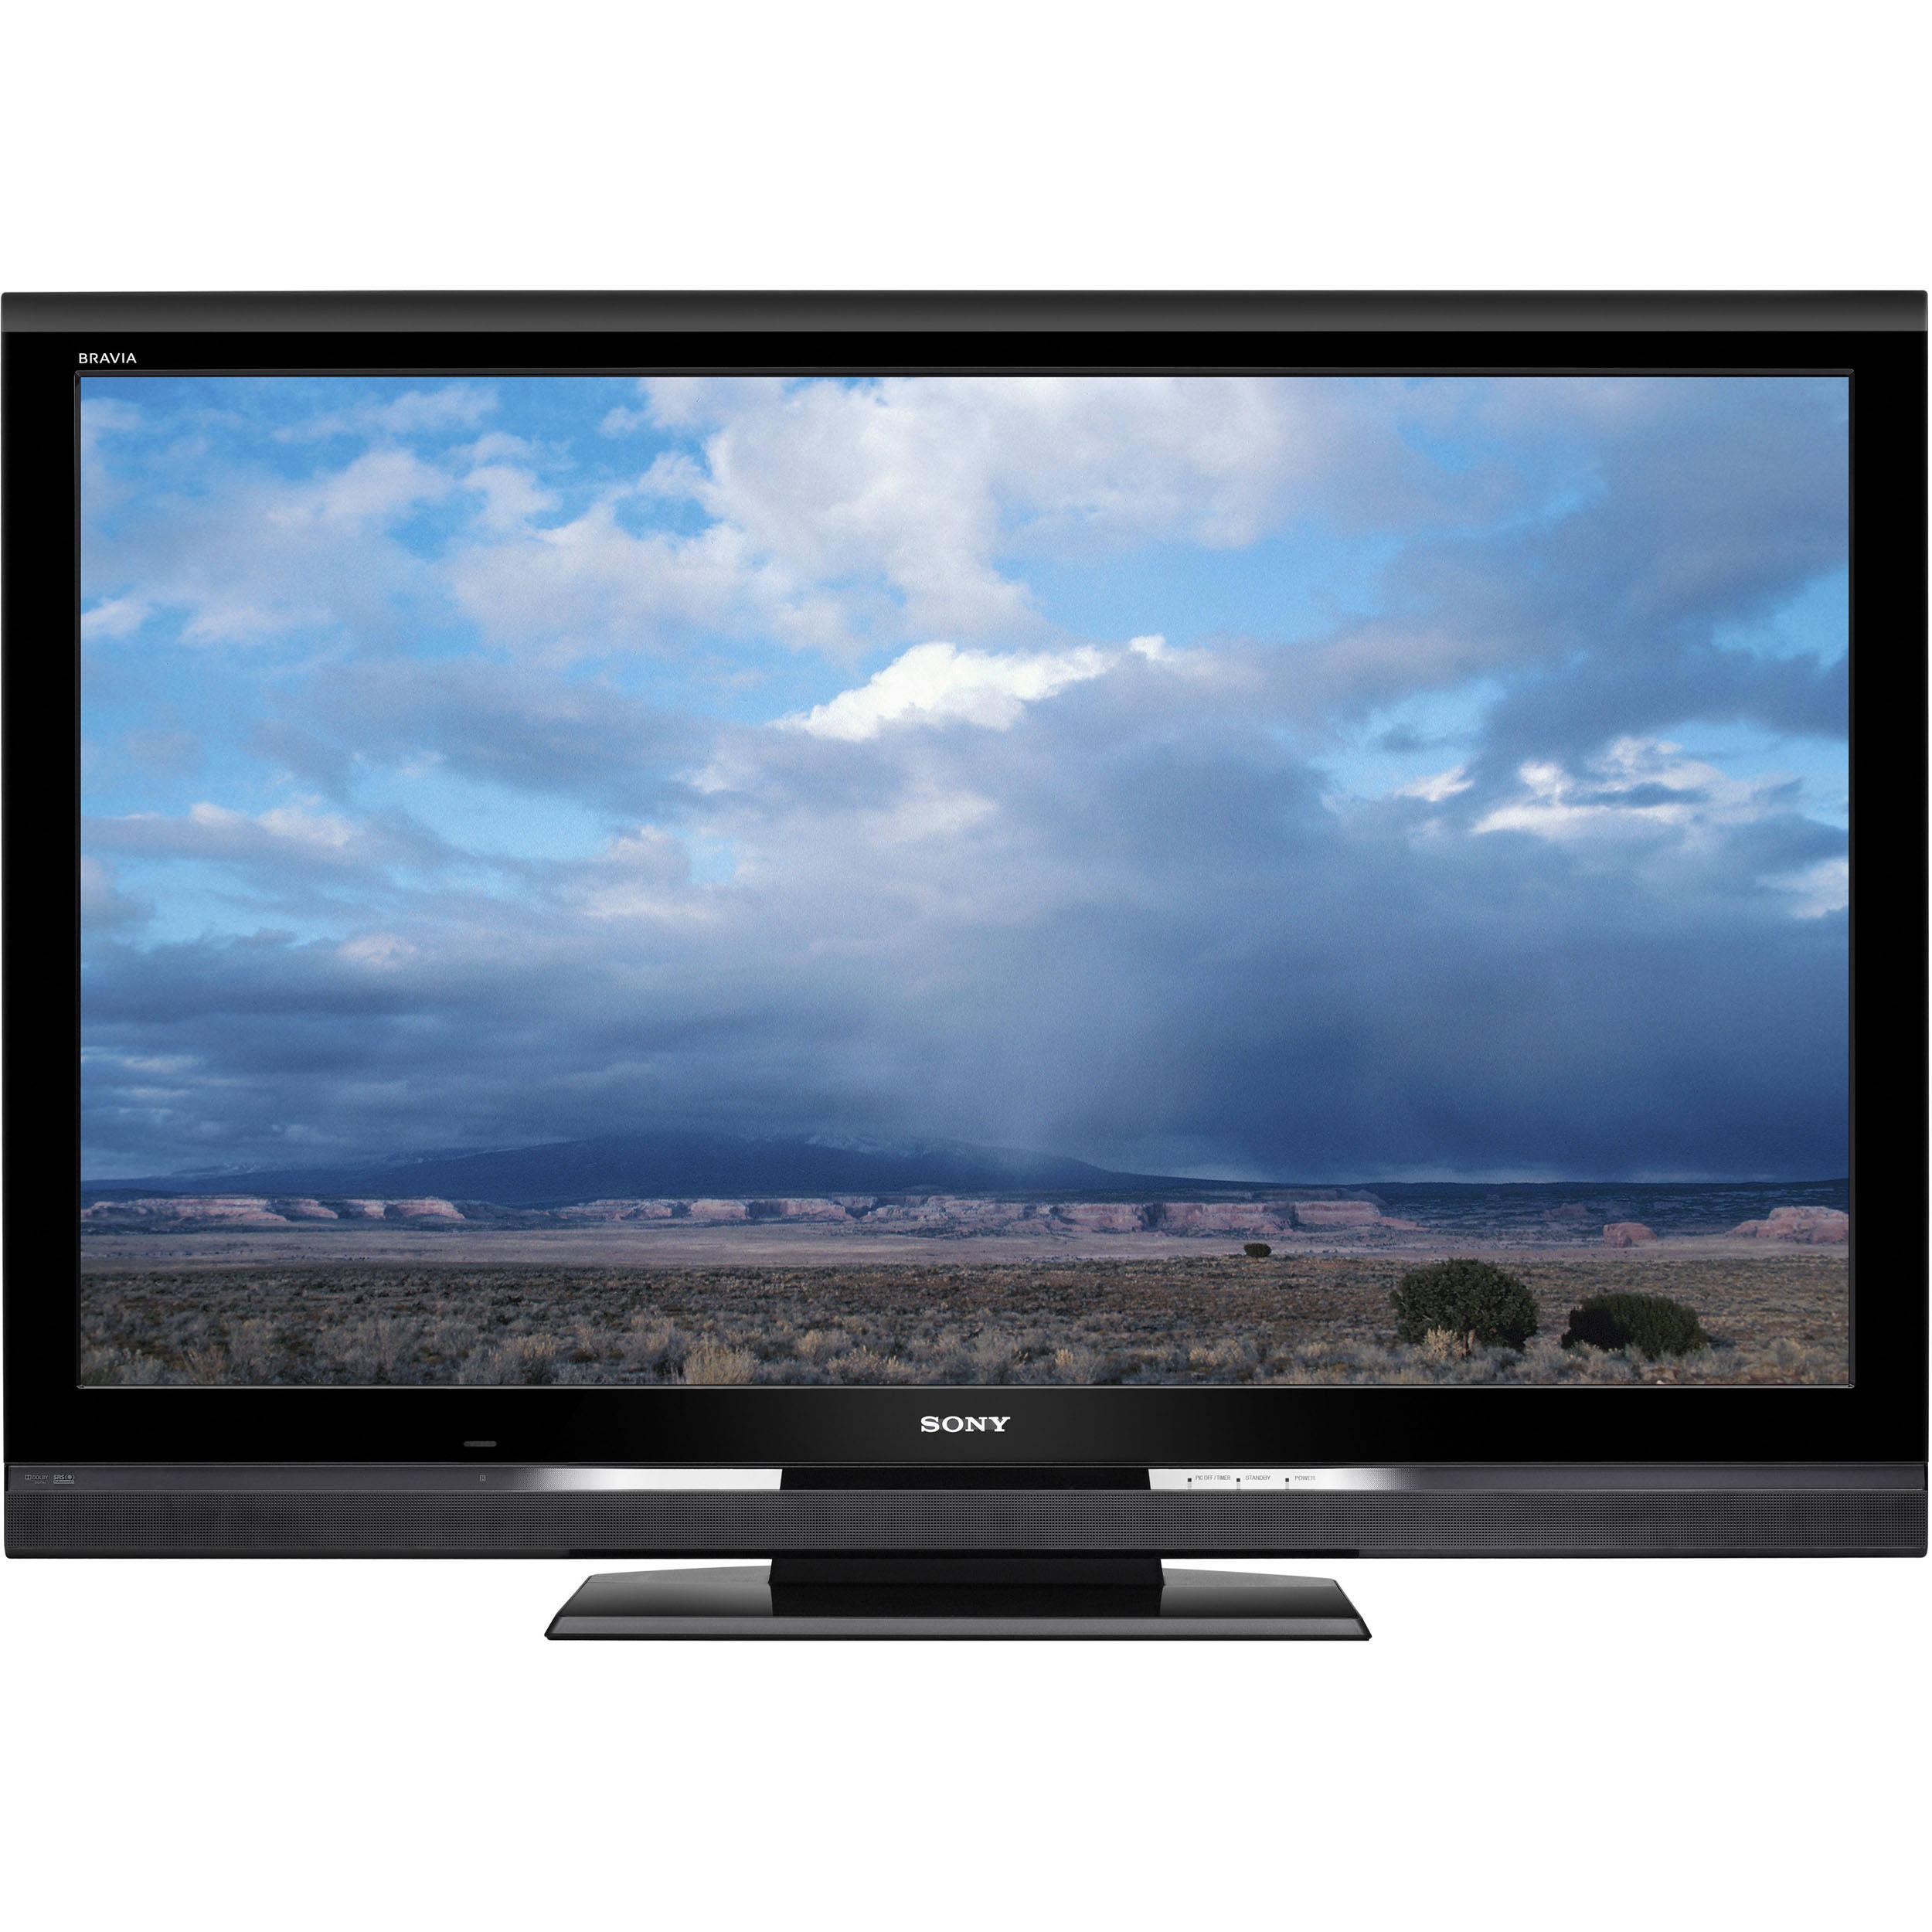 Sony 40 BRAVIA Pro LCD Display W RS 232